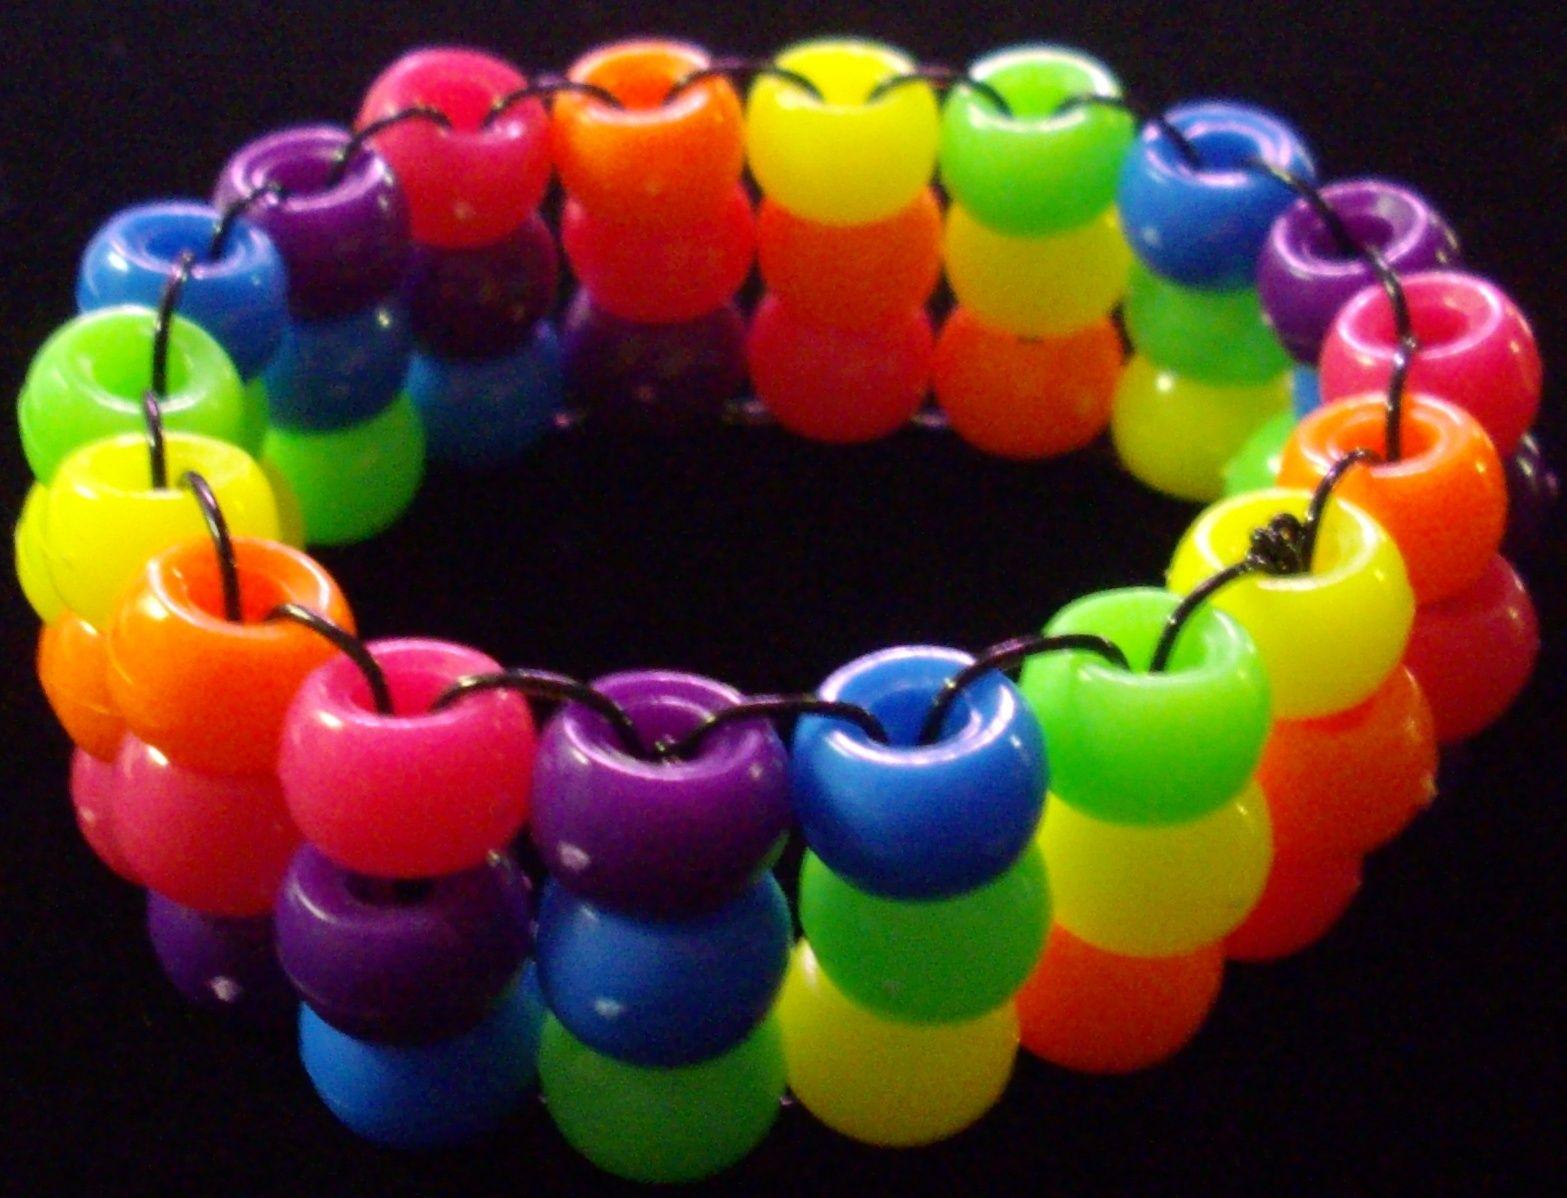 How to Make Rave Kandi Bracelets and Patterns | Kandi, Rave and ...